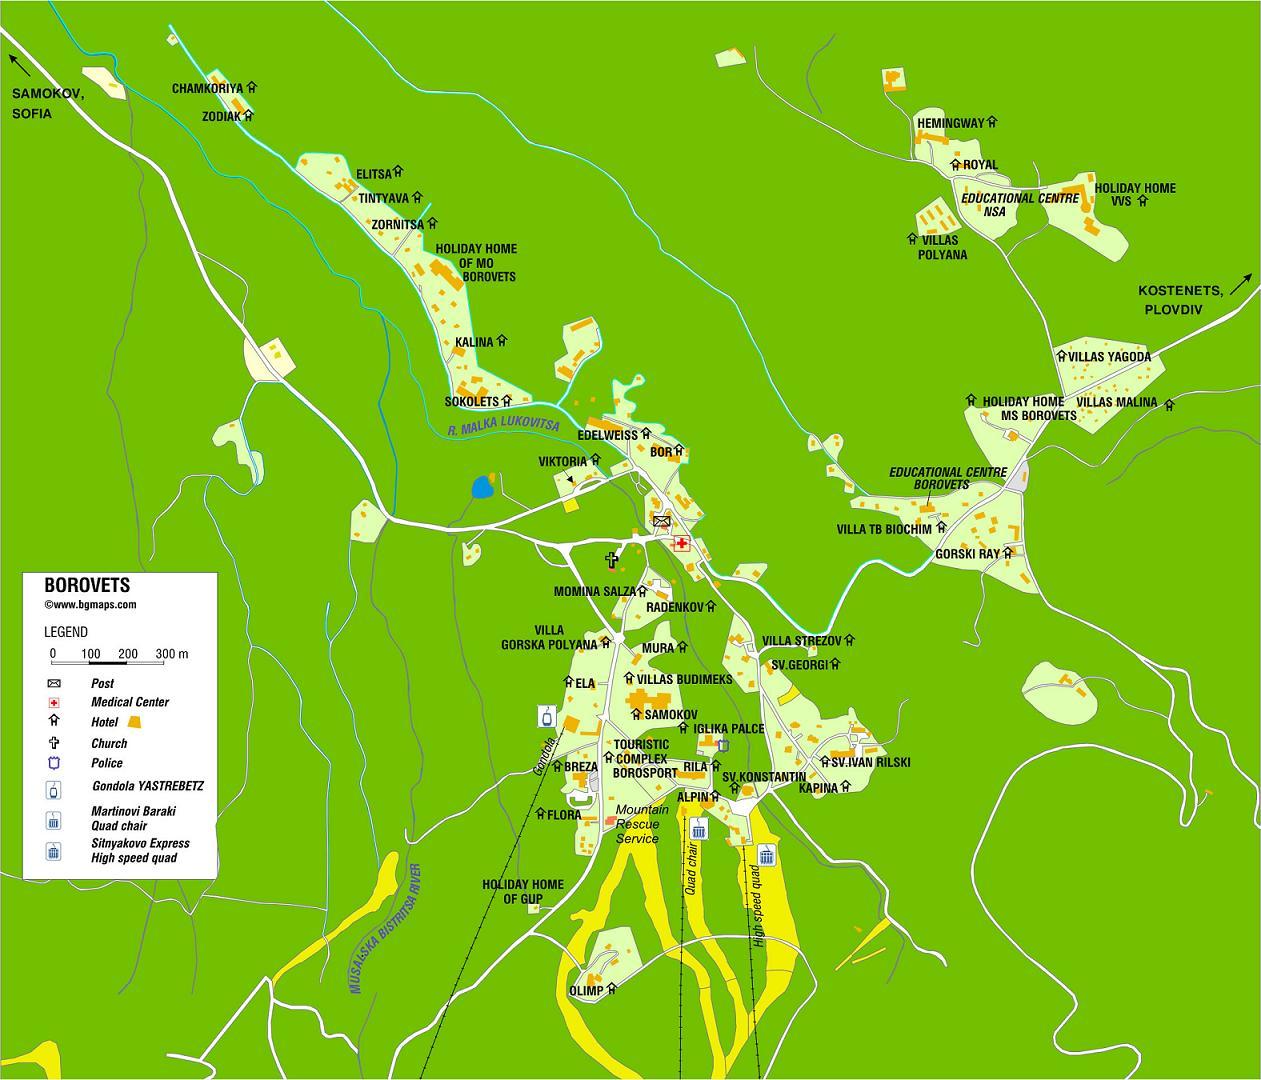 Borovets, city map, Bulgaria